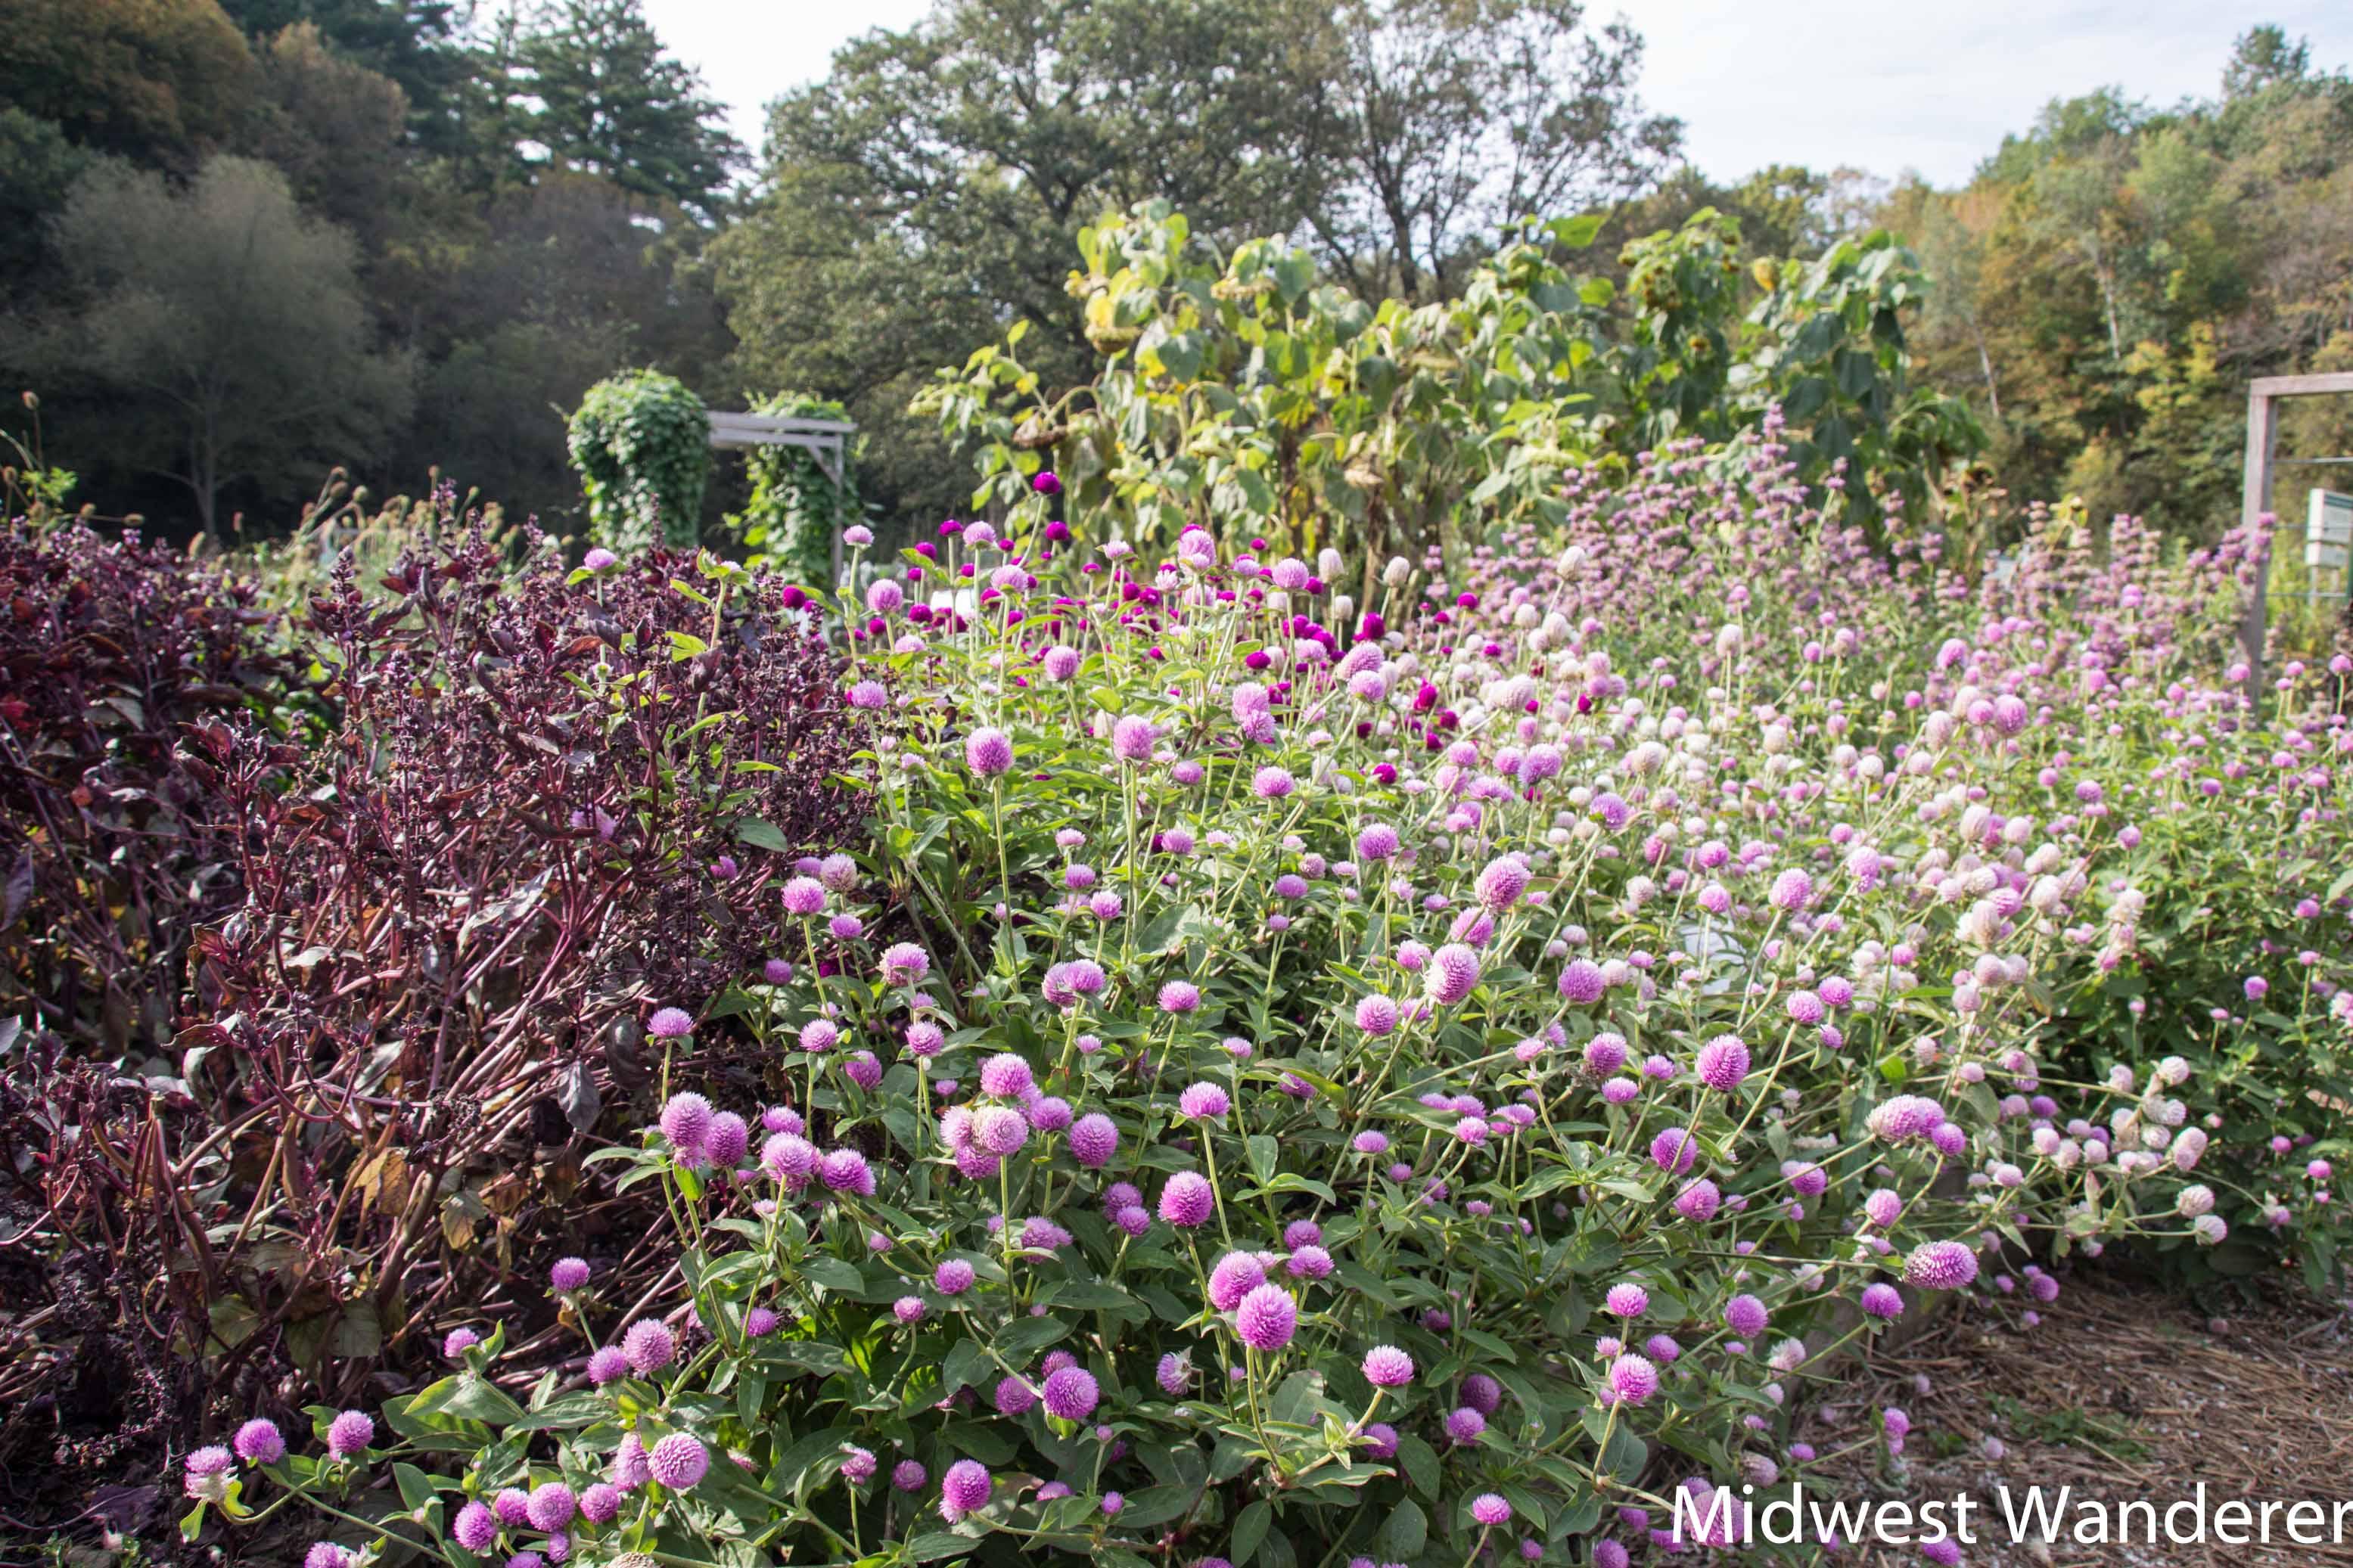 Display garden at Seed Savers Exchange